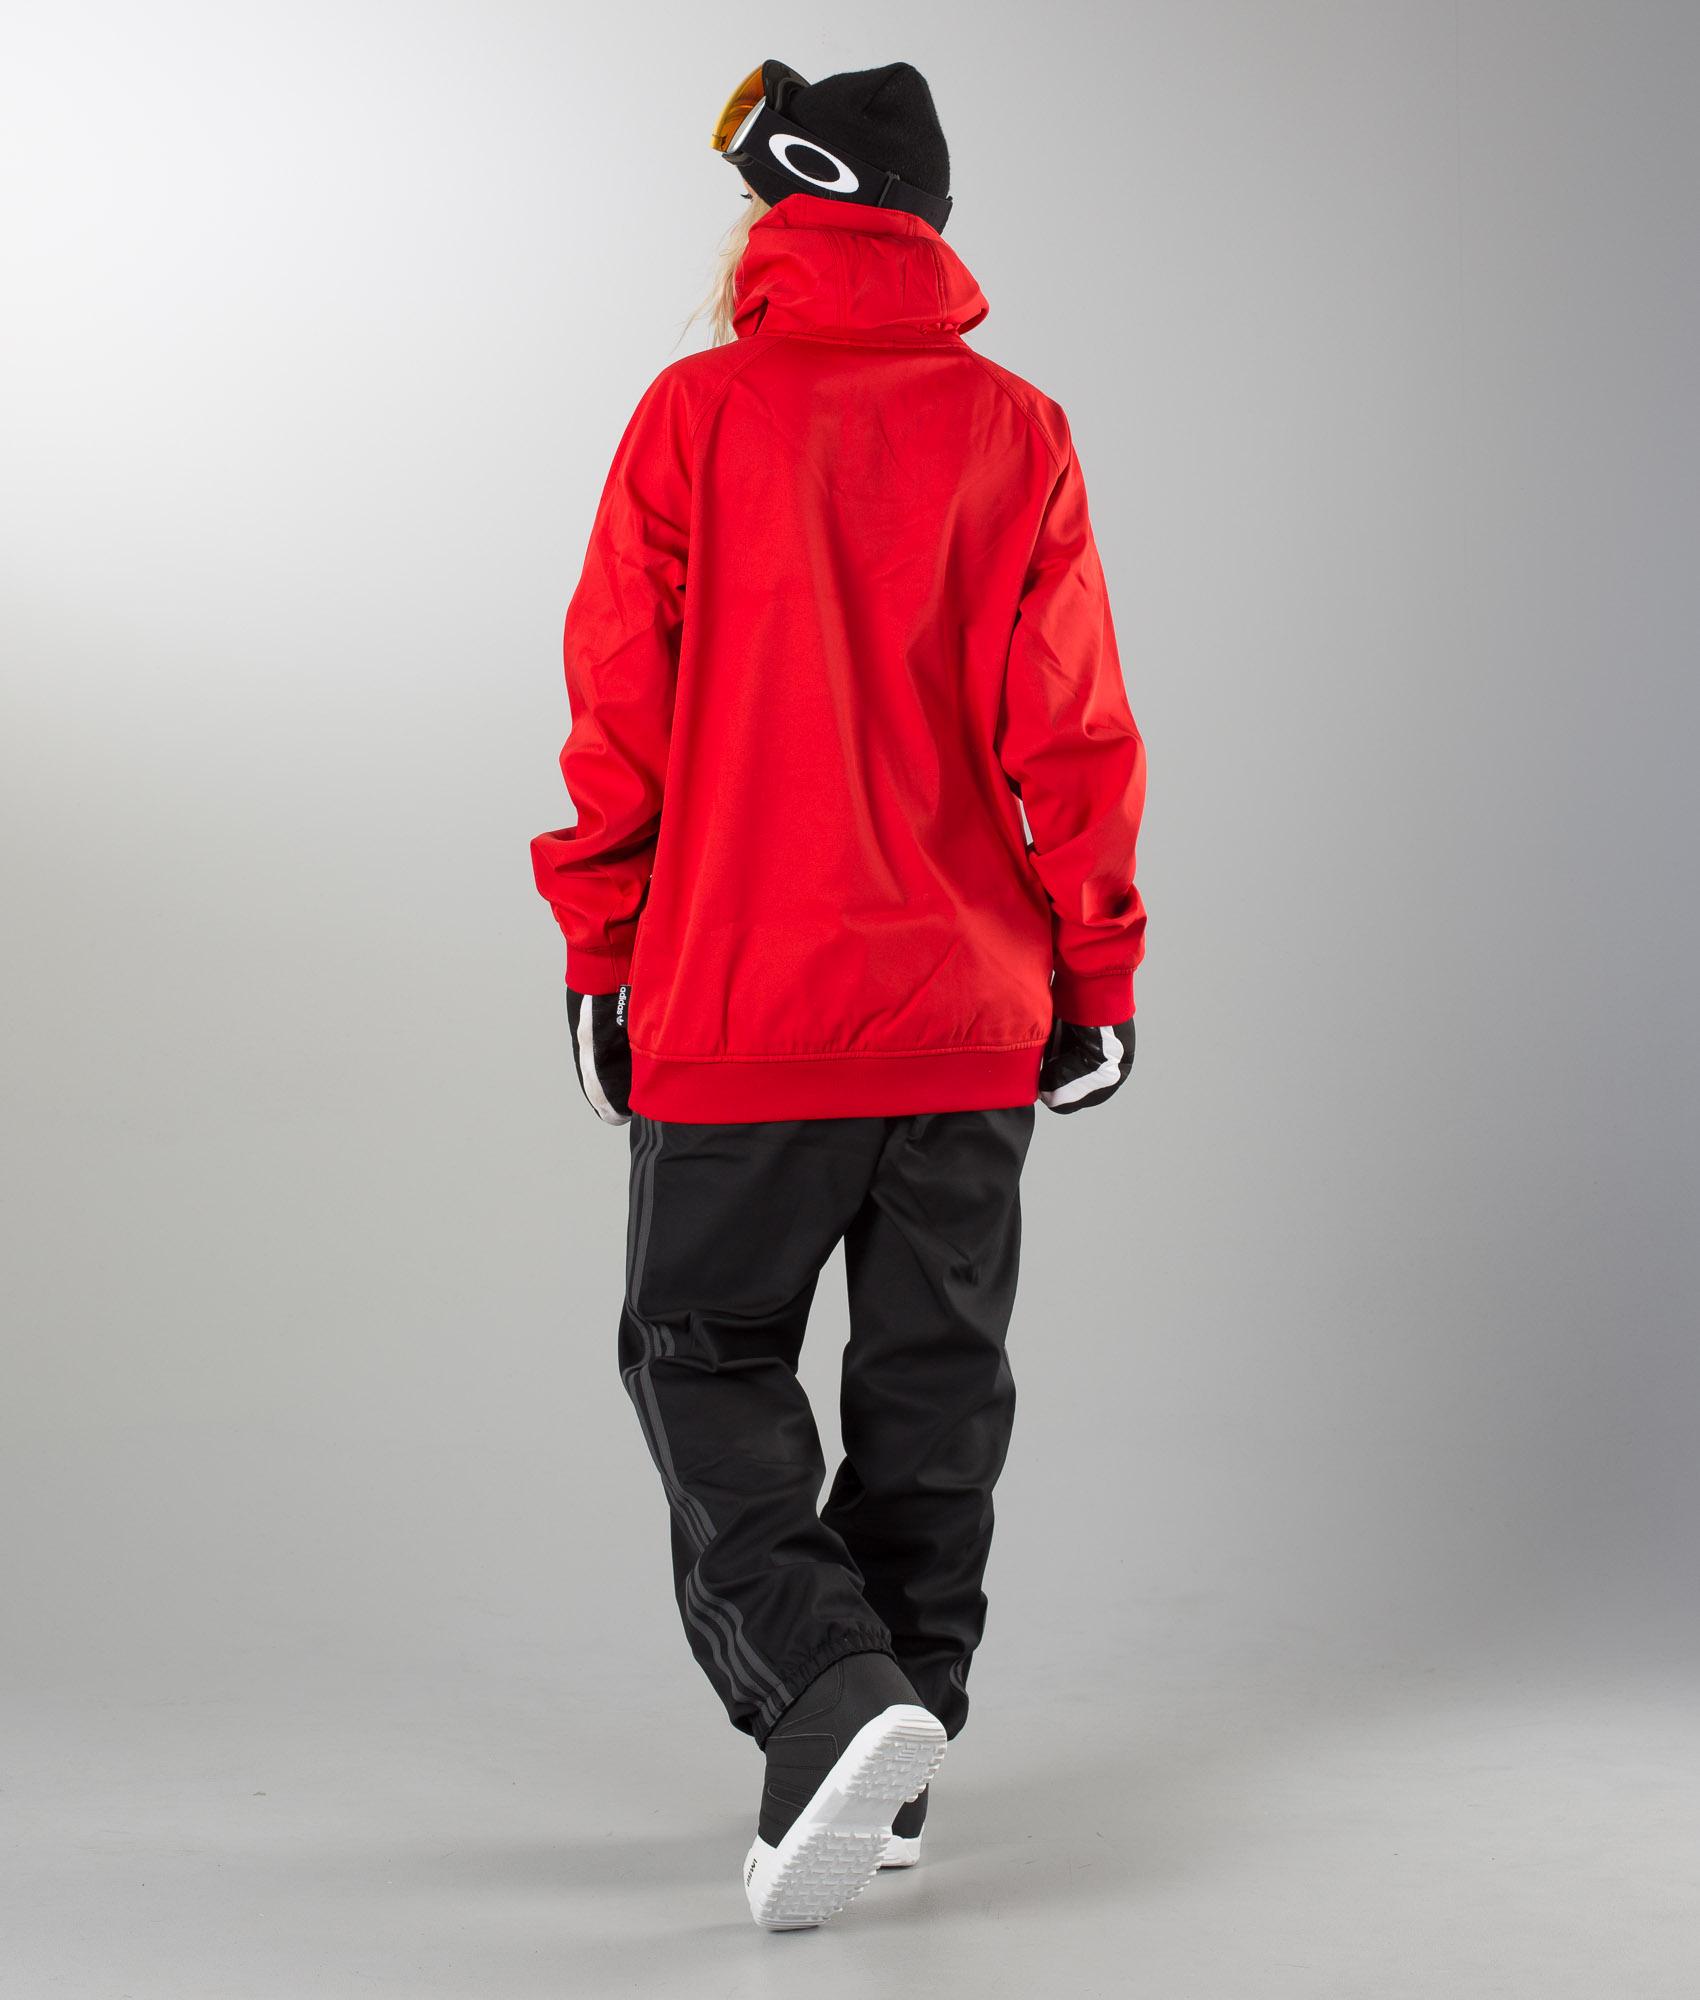 Adidas Giacca Greeley Snowboard Unisex Da Snowboarding Scarletwhite OUOWwxH